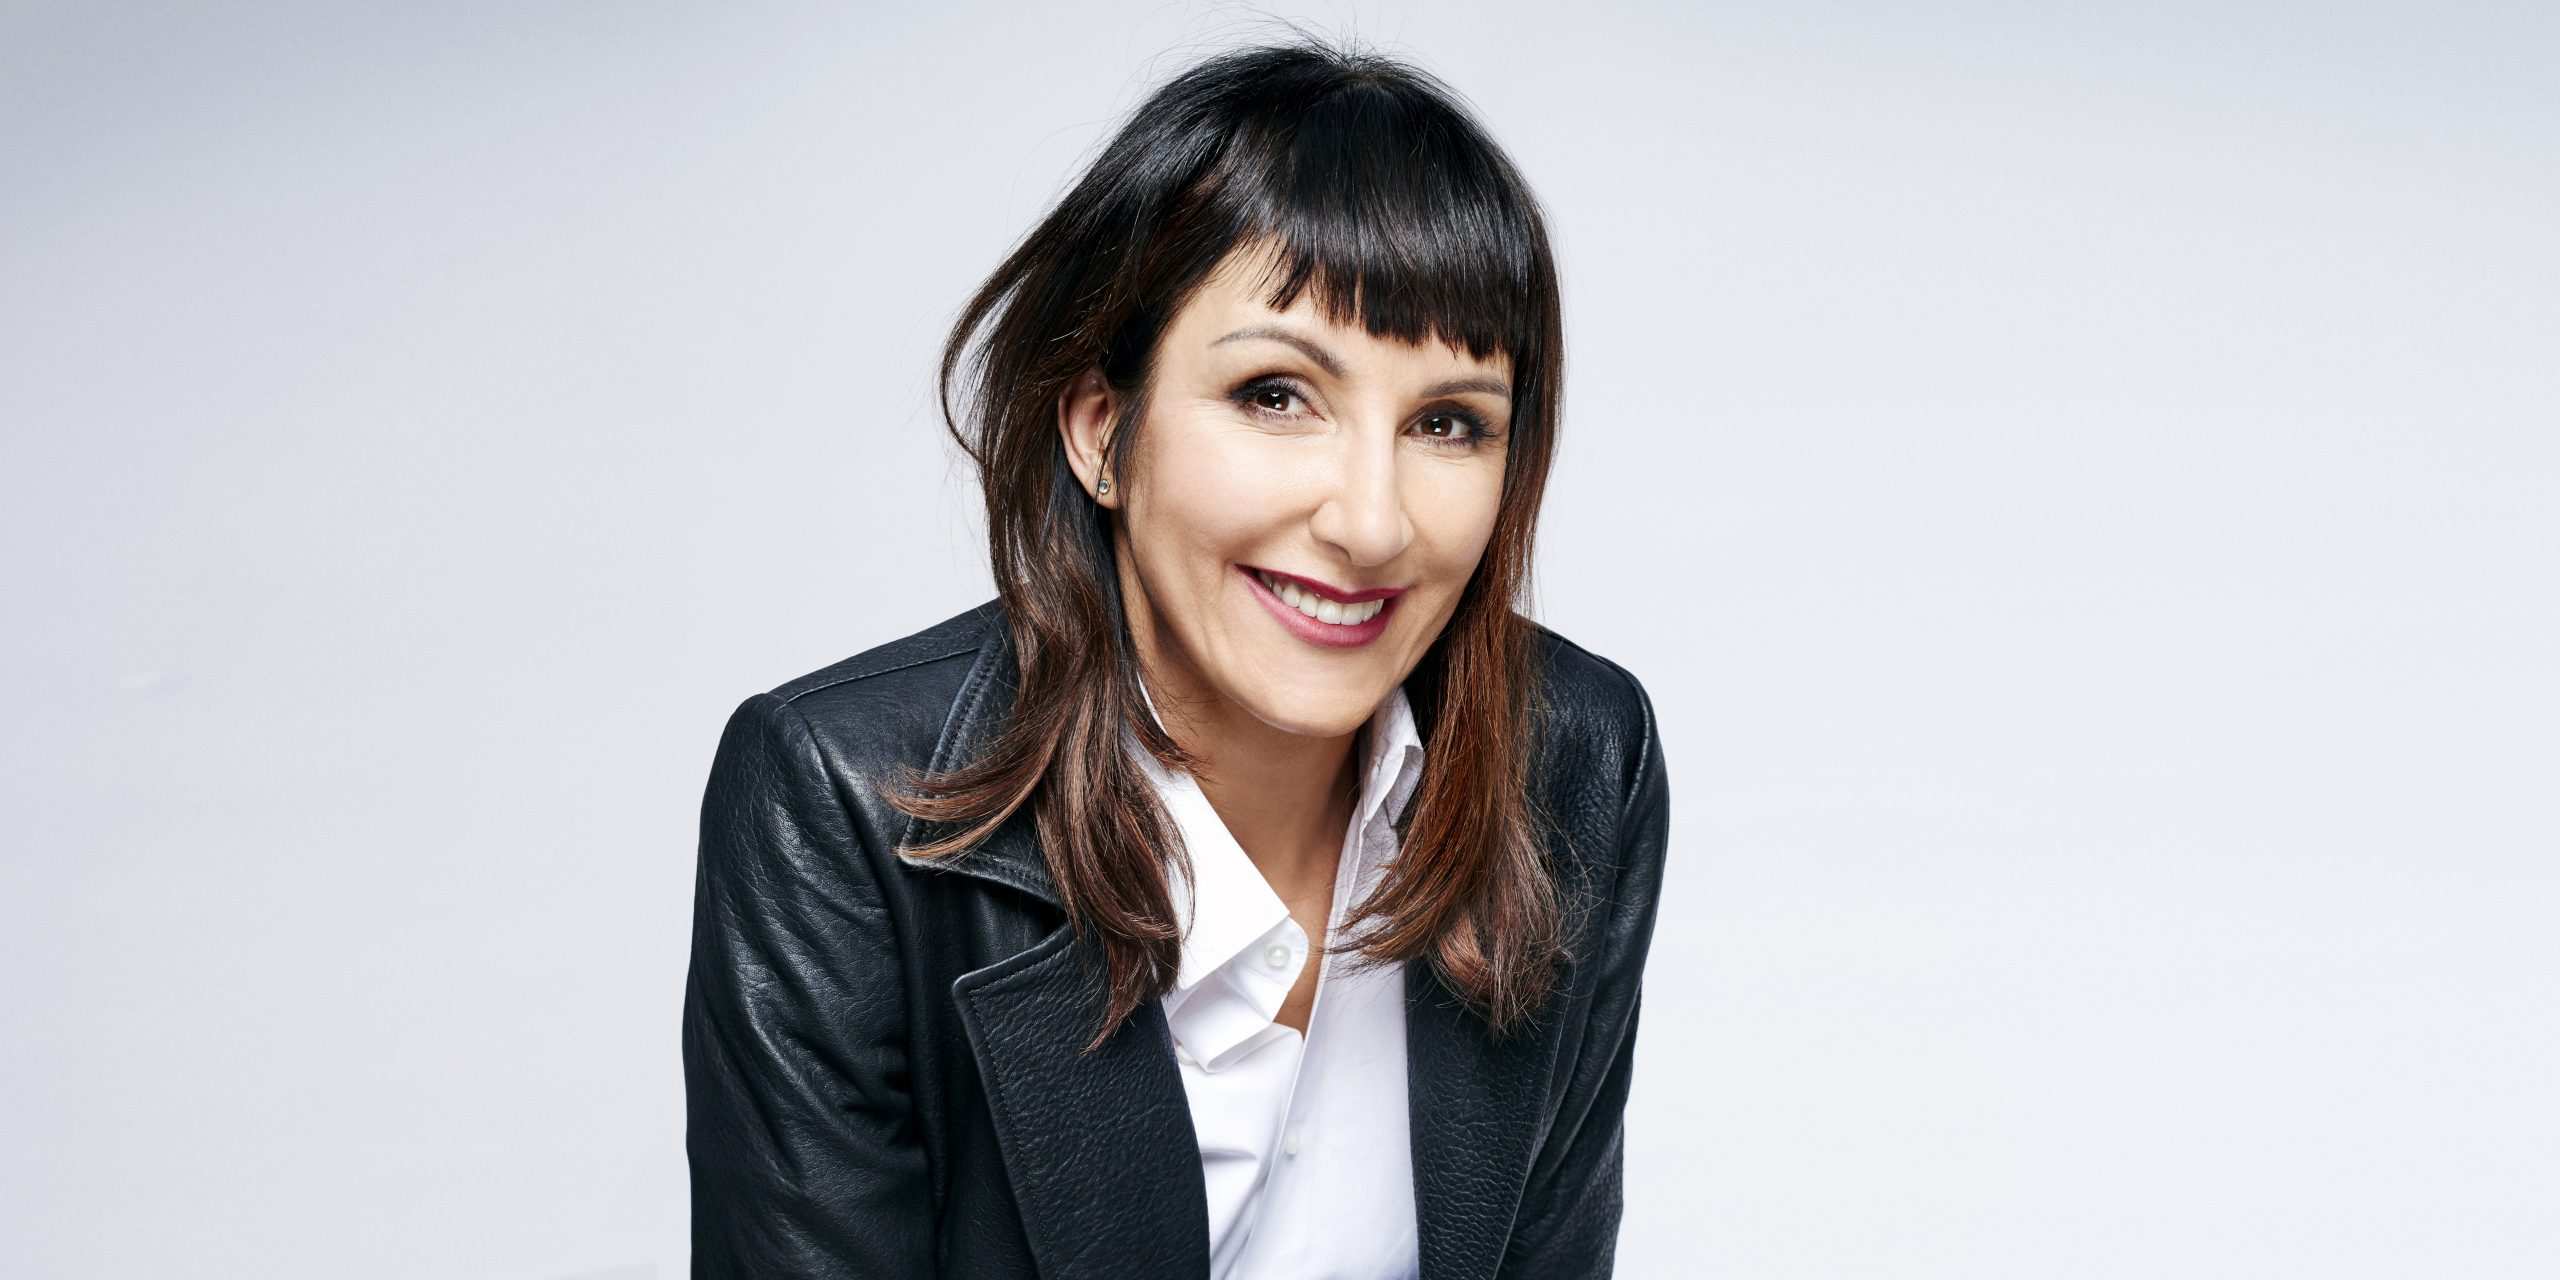 ginekolog Marzena Dębska